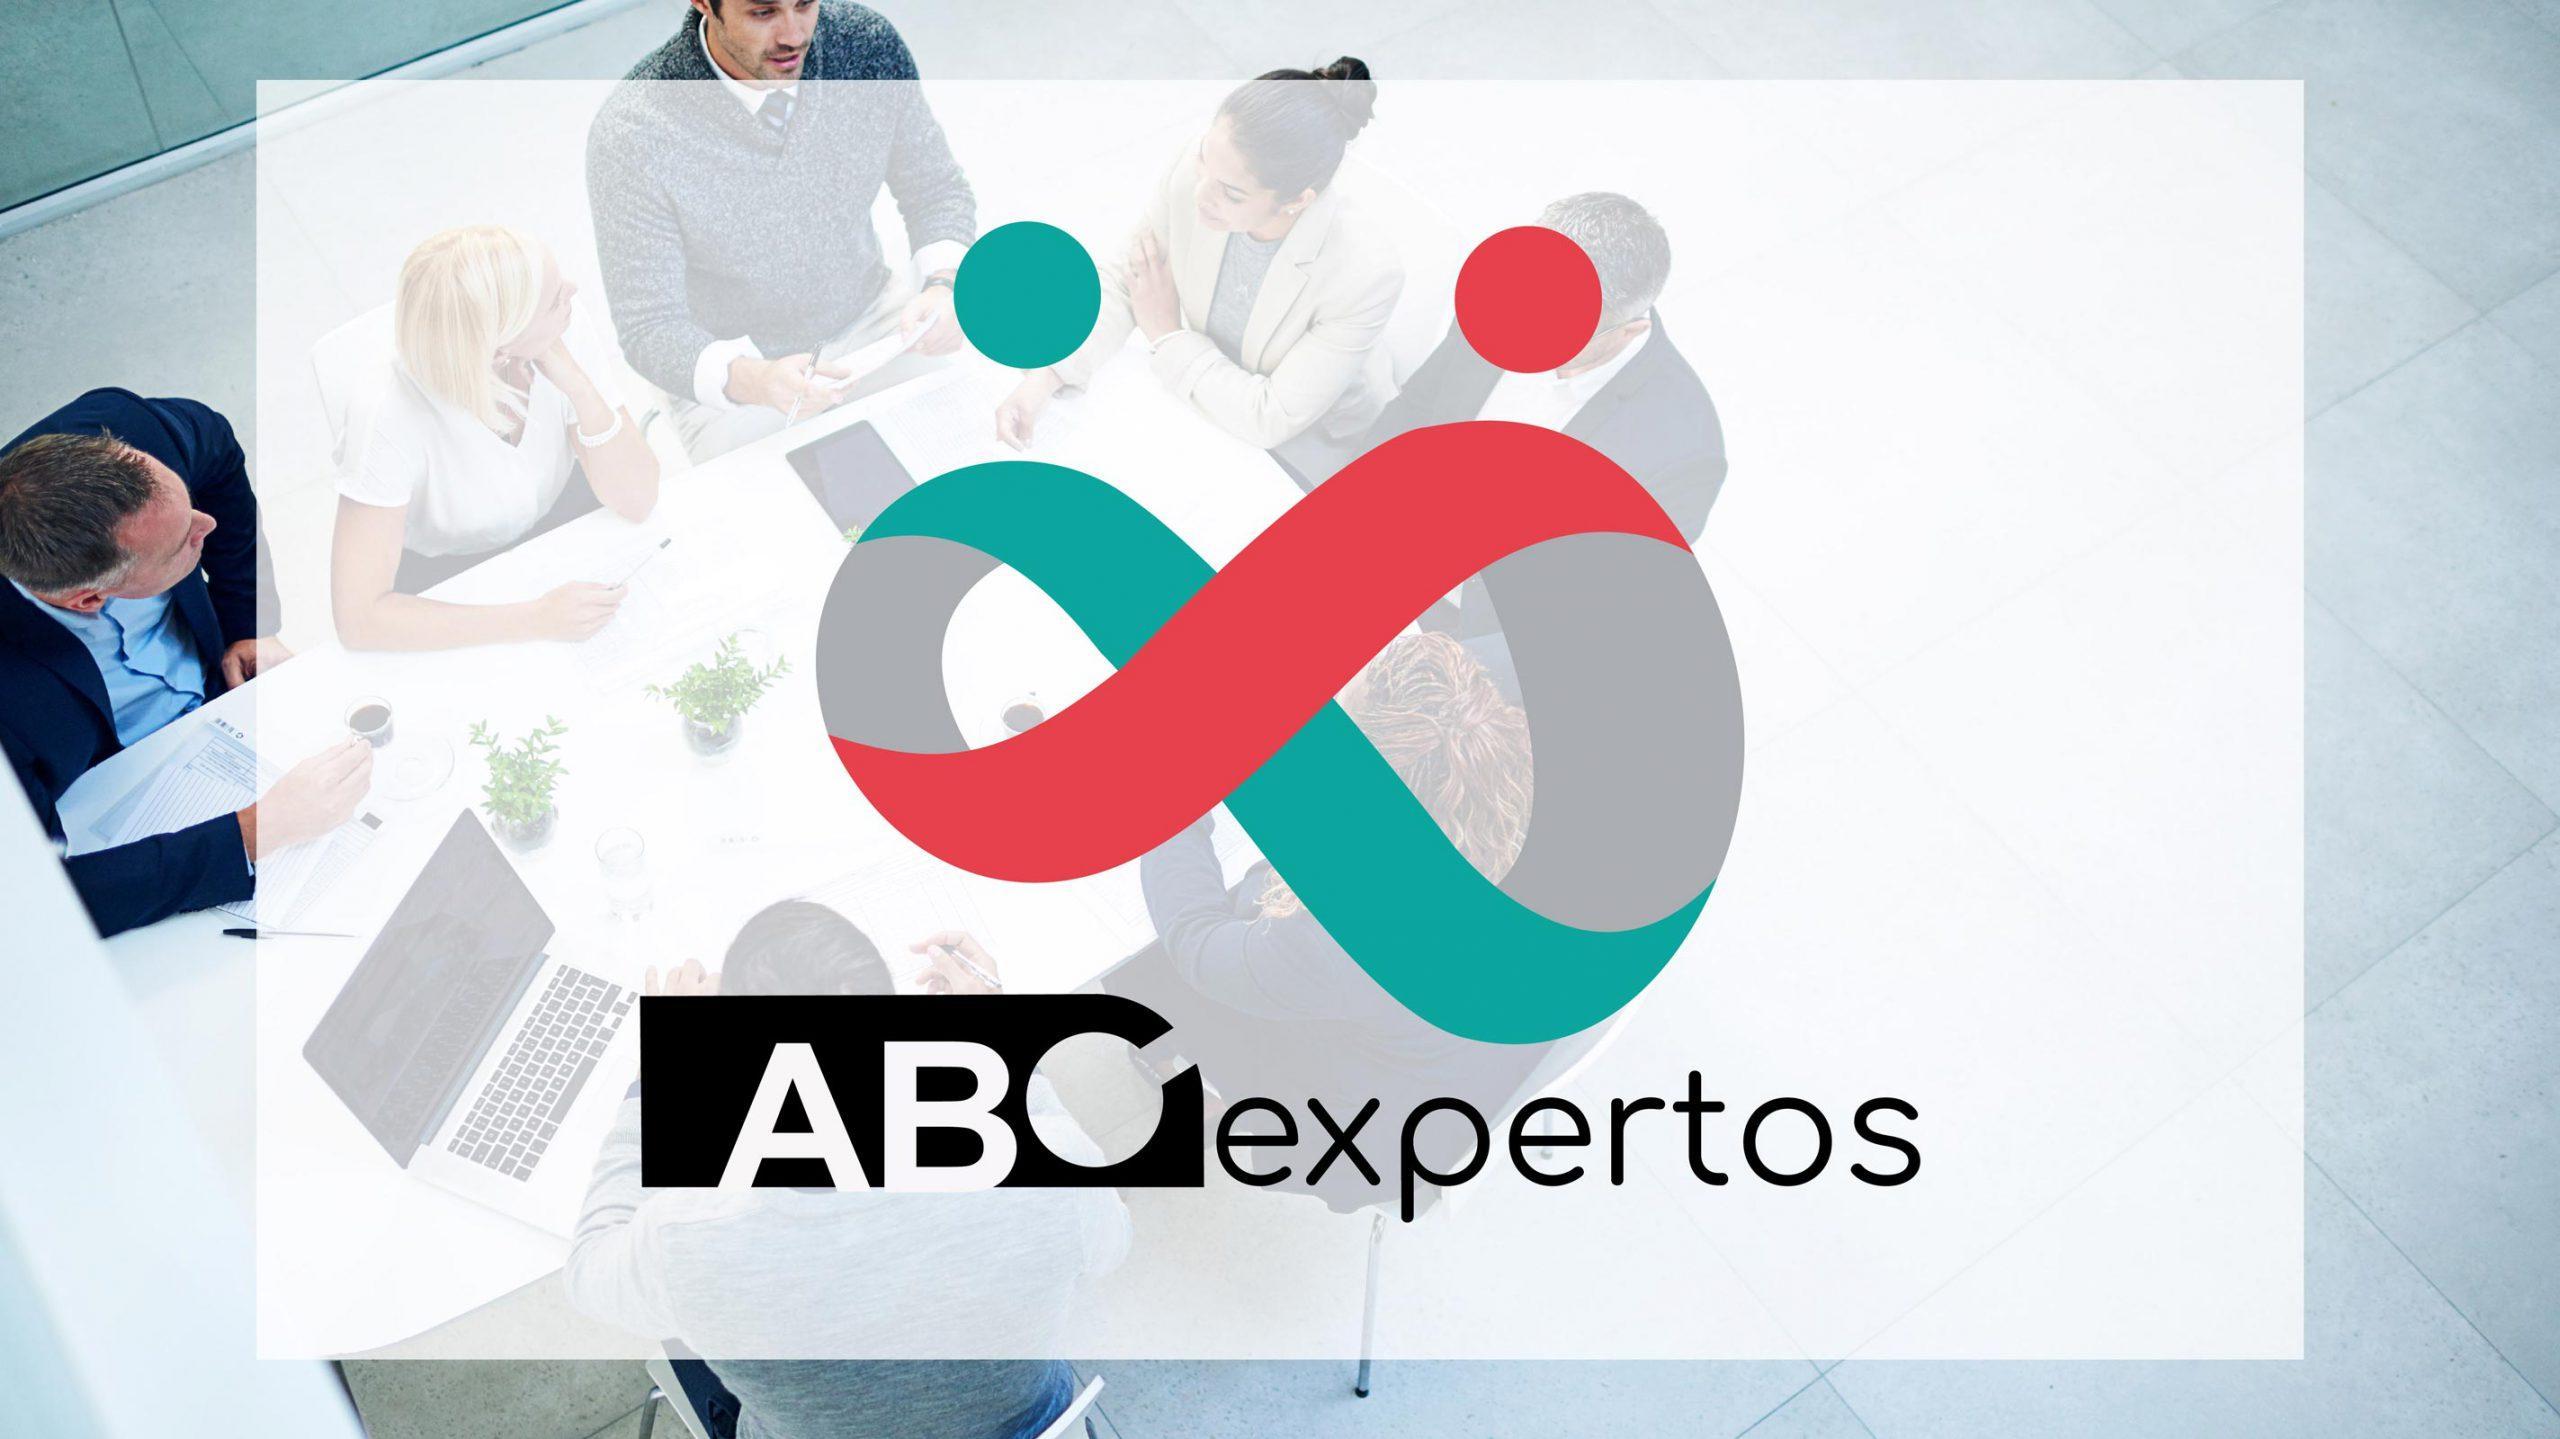 ABC Expertos